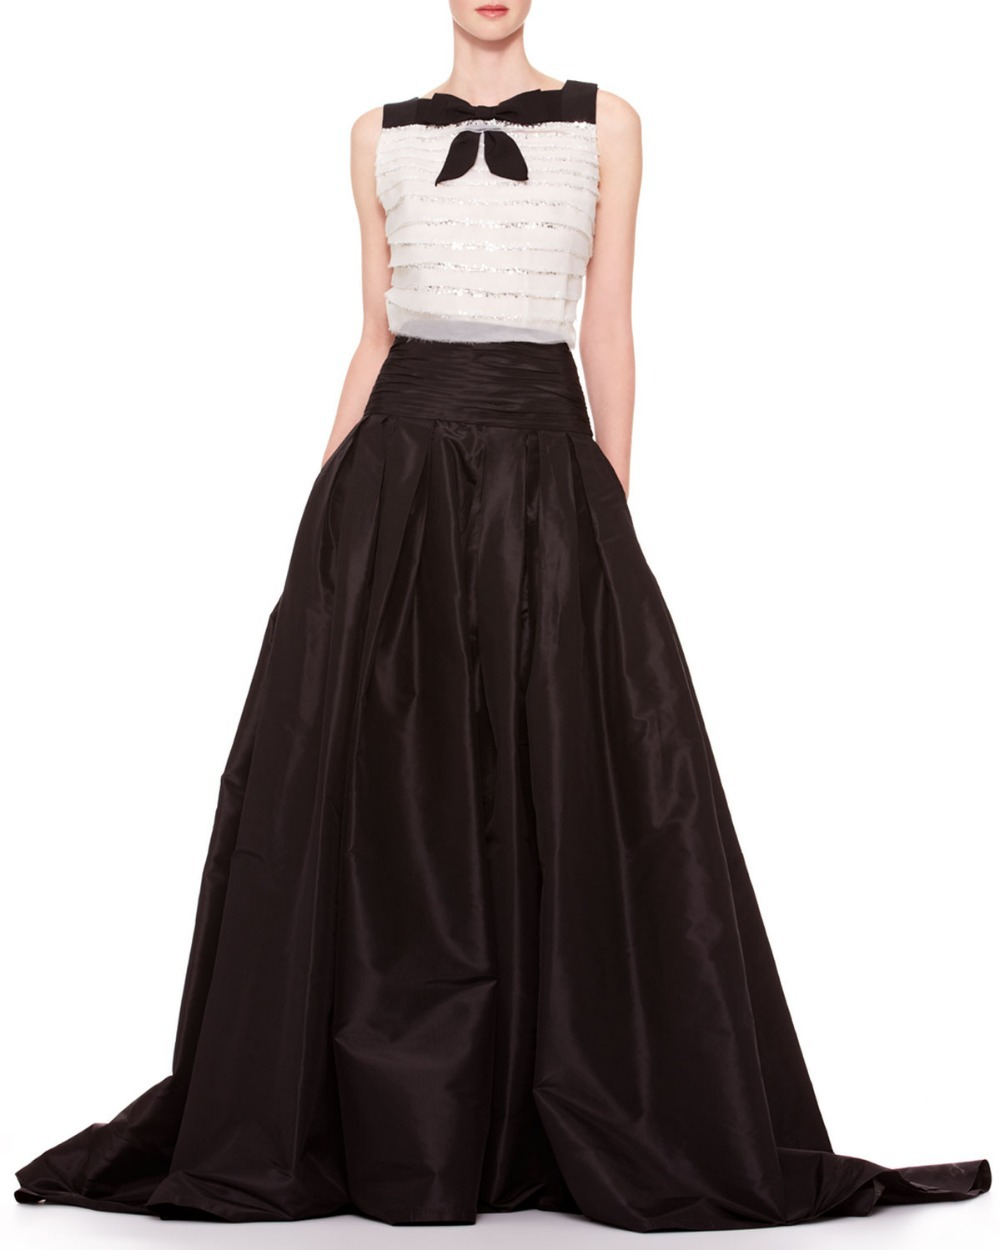 Long Ball Skirt - Skirts